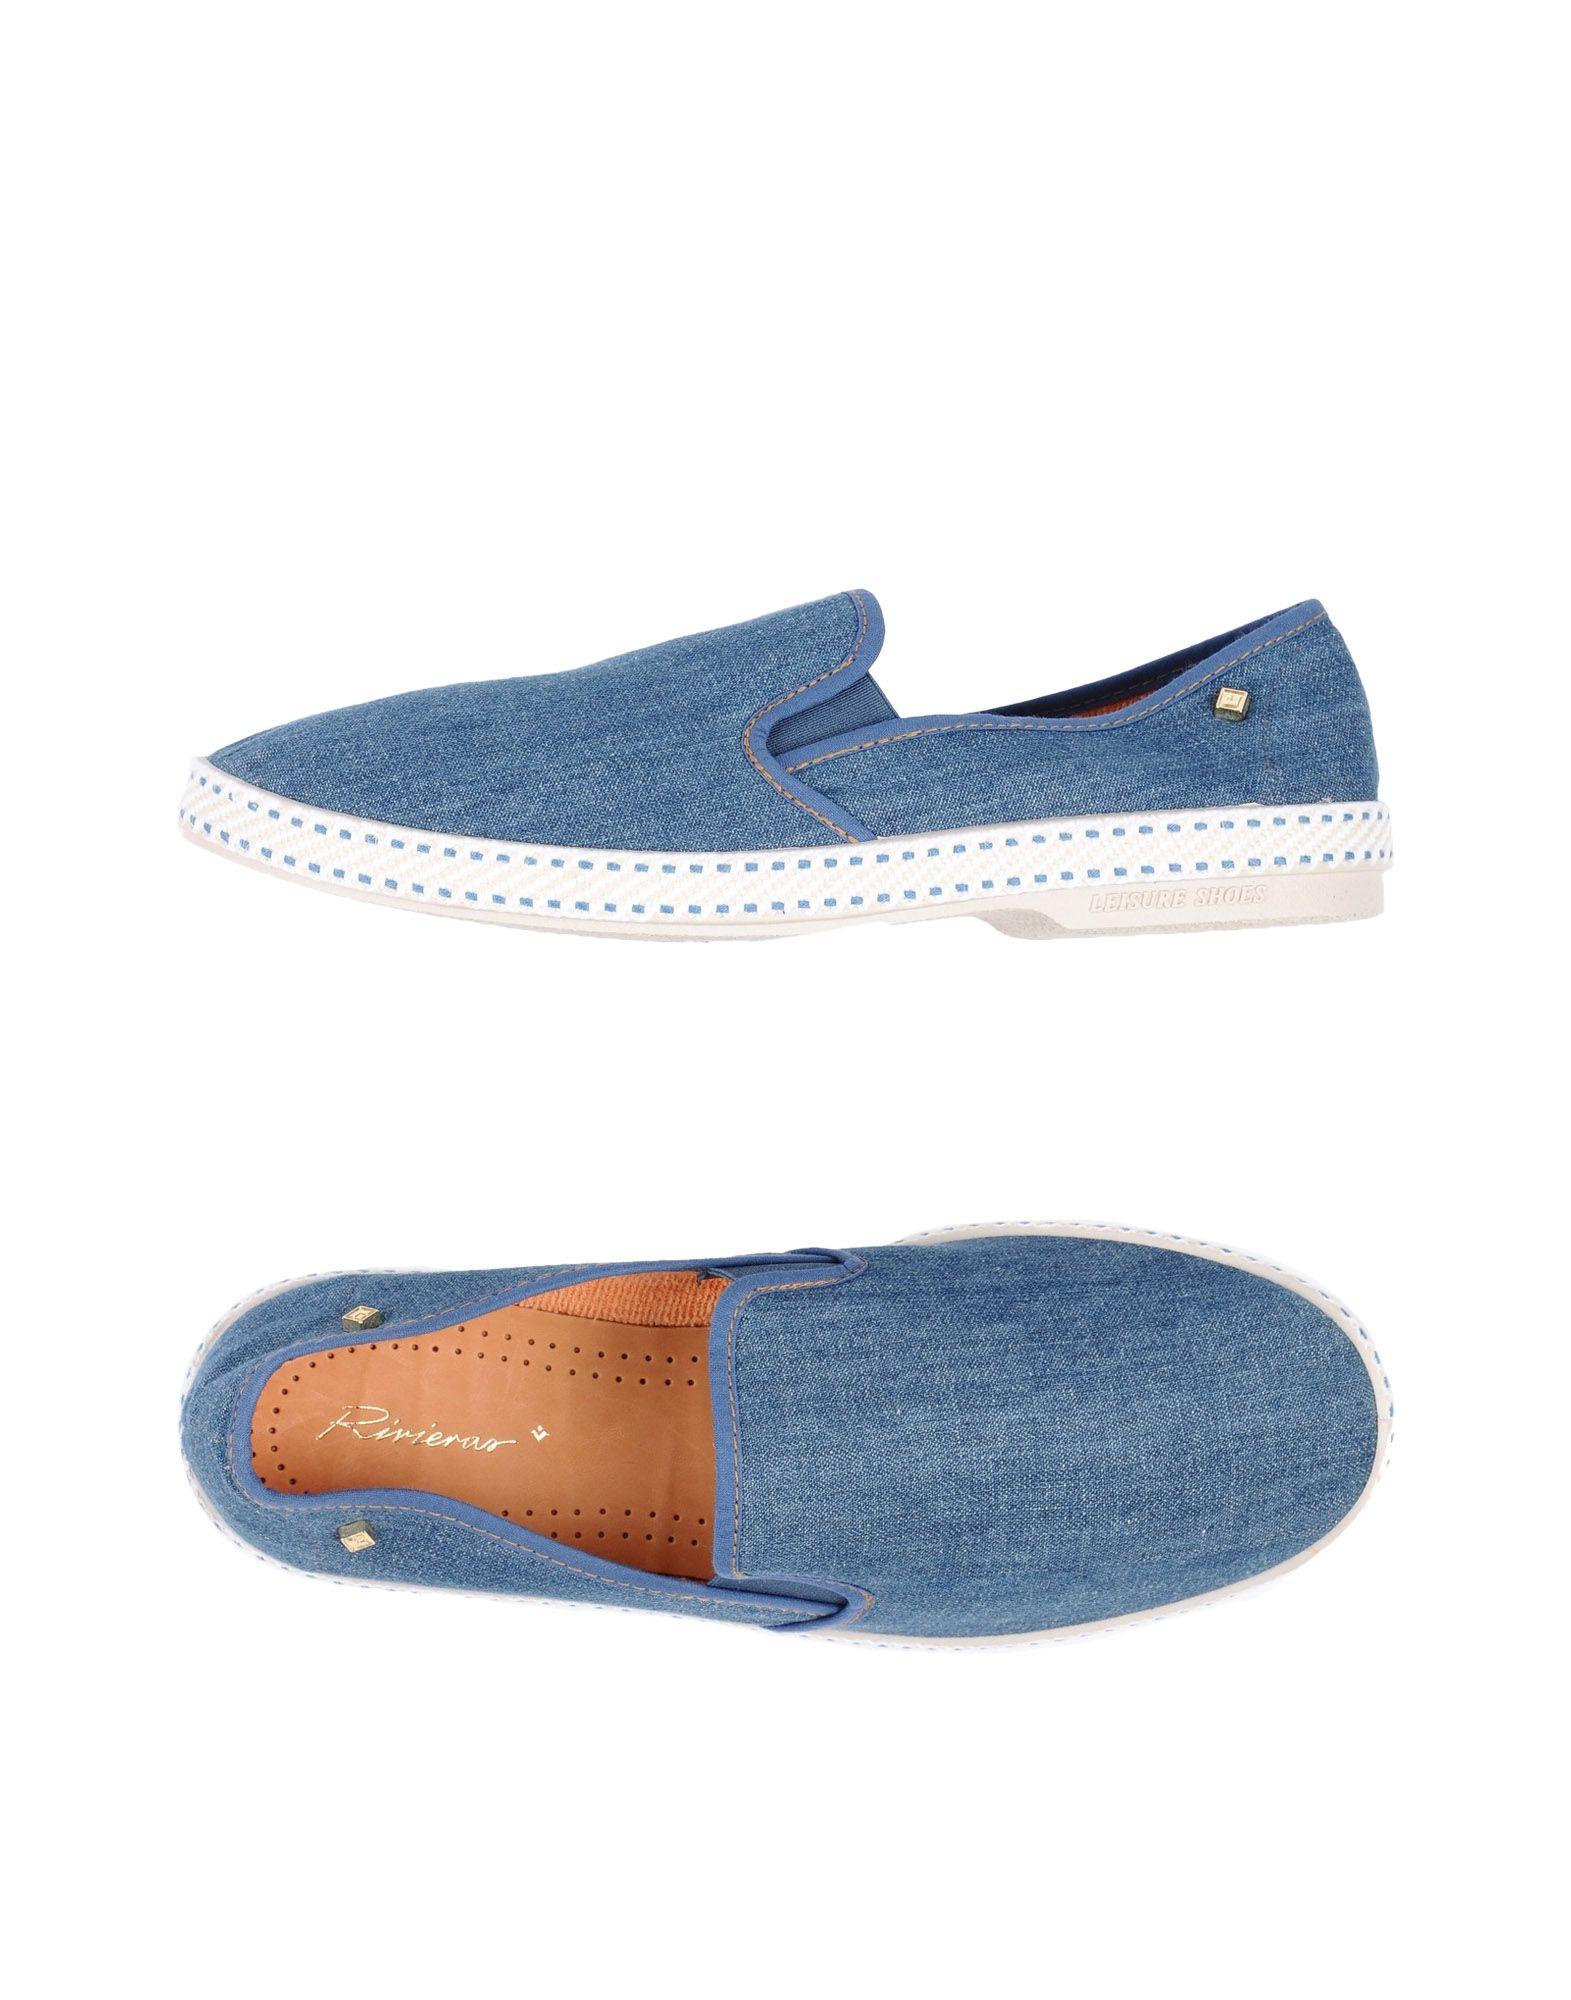 Rabatt echte Schuhe Herren Rivieras Sneakers Herren Schuhe  11357477NA 8a2c0a